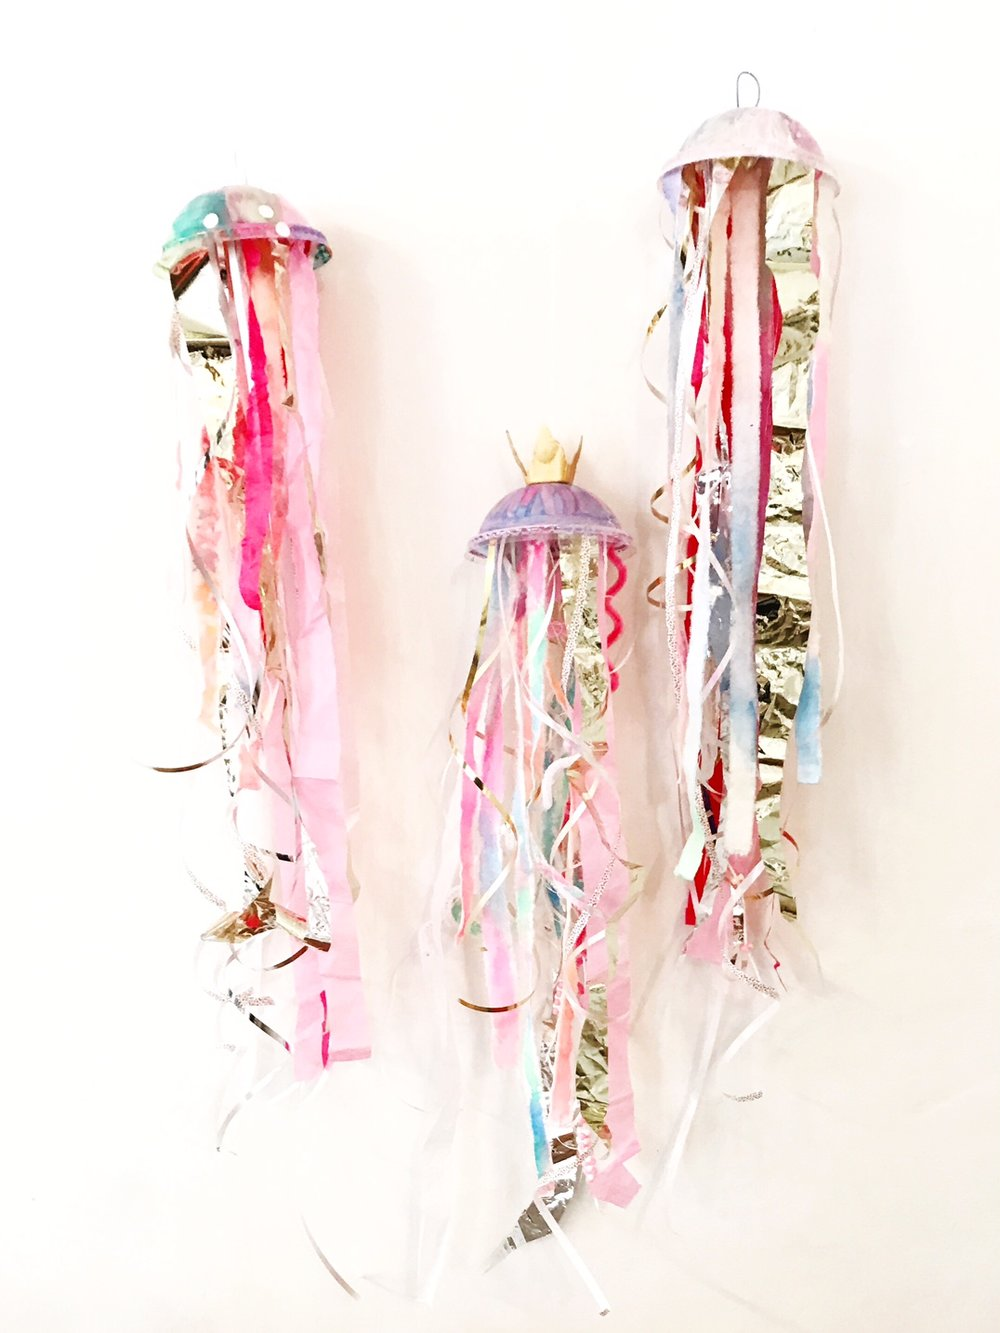 3-D Jellyfish 7